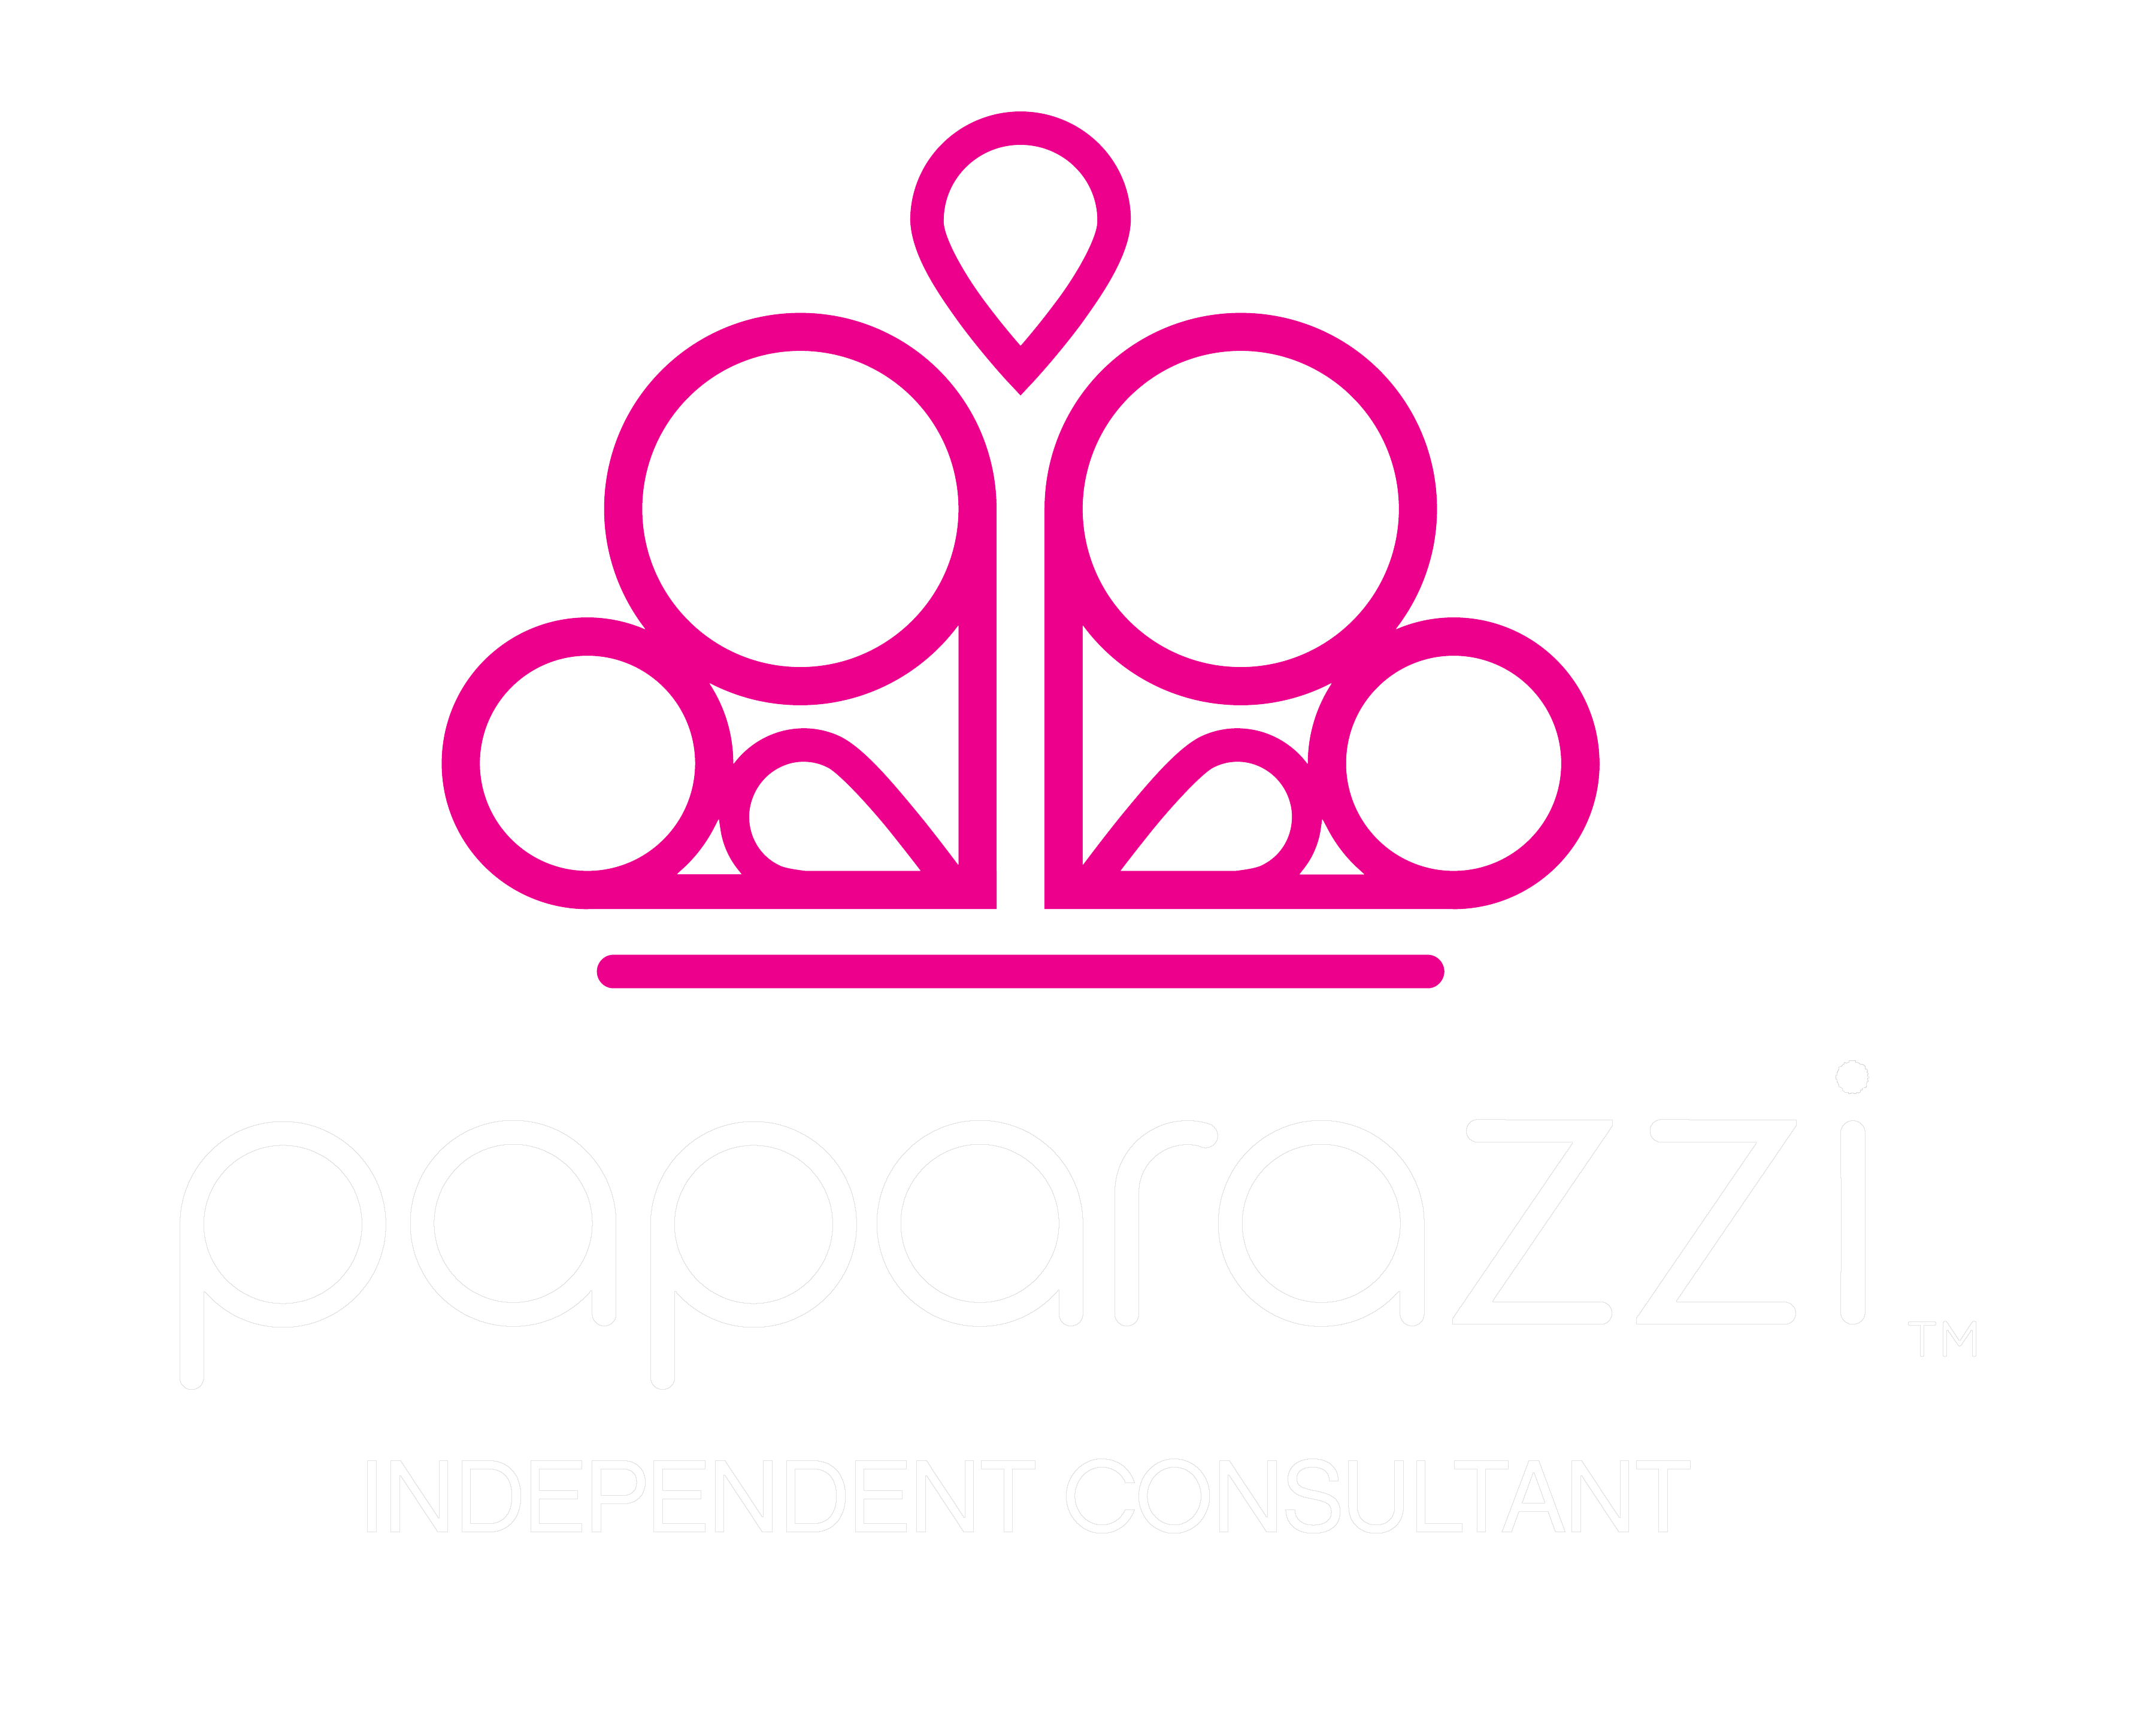 Paparazzi logo transparent hq. Marbles clipart white background